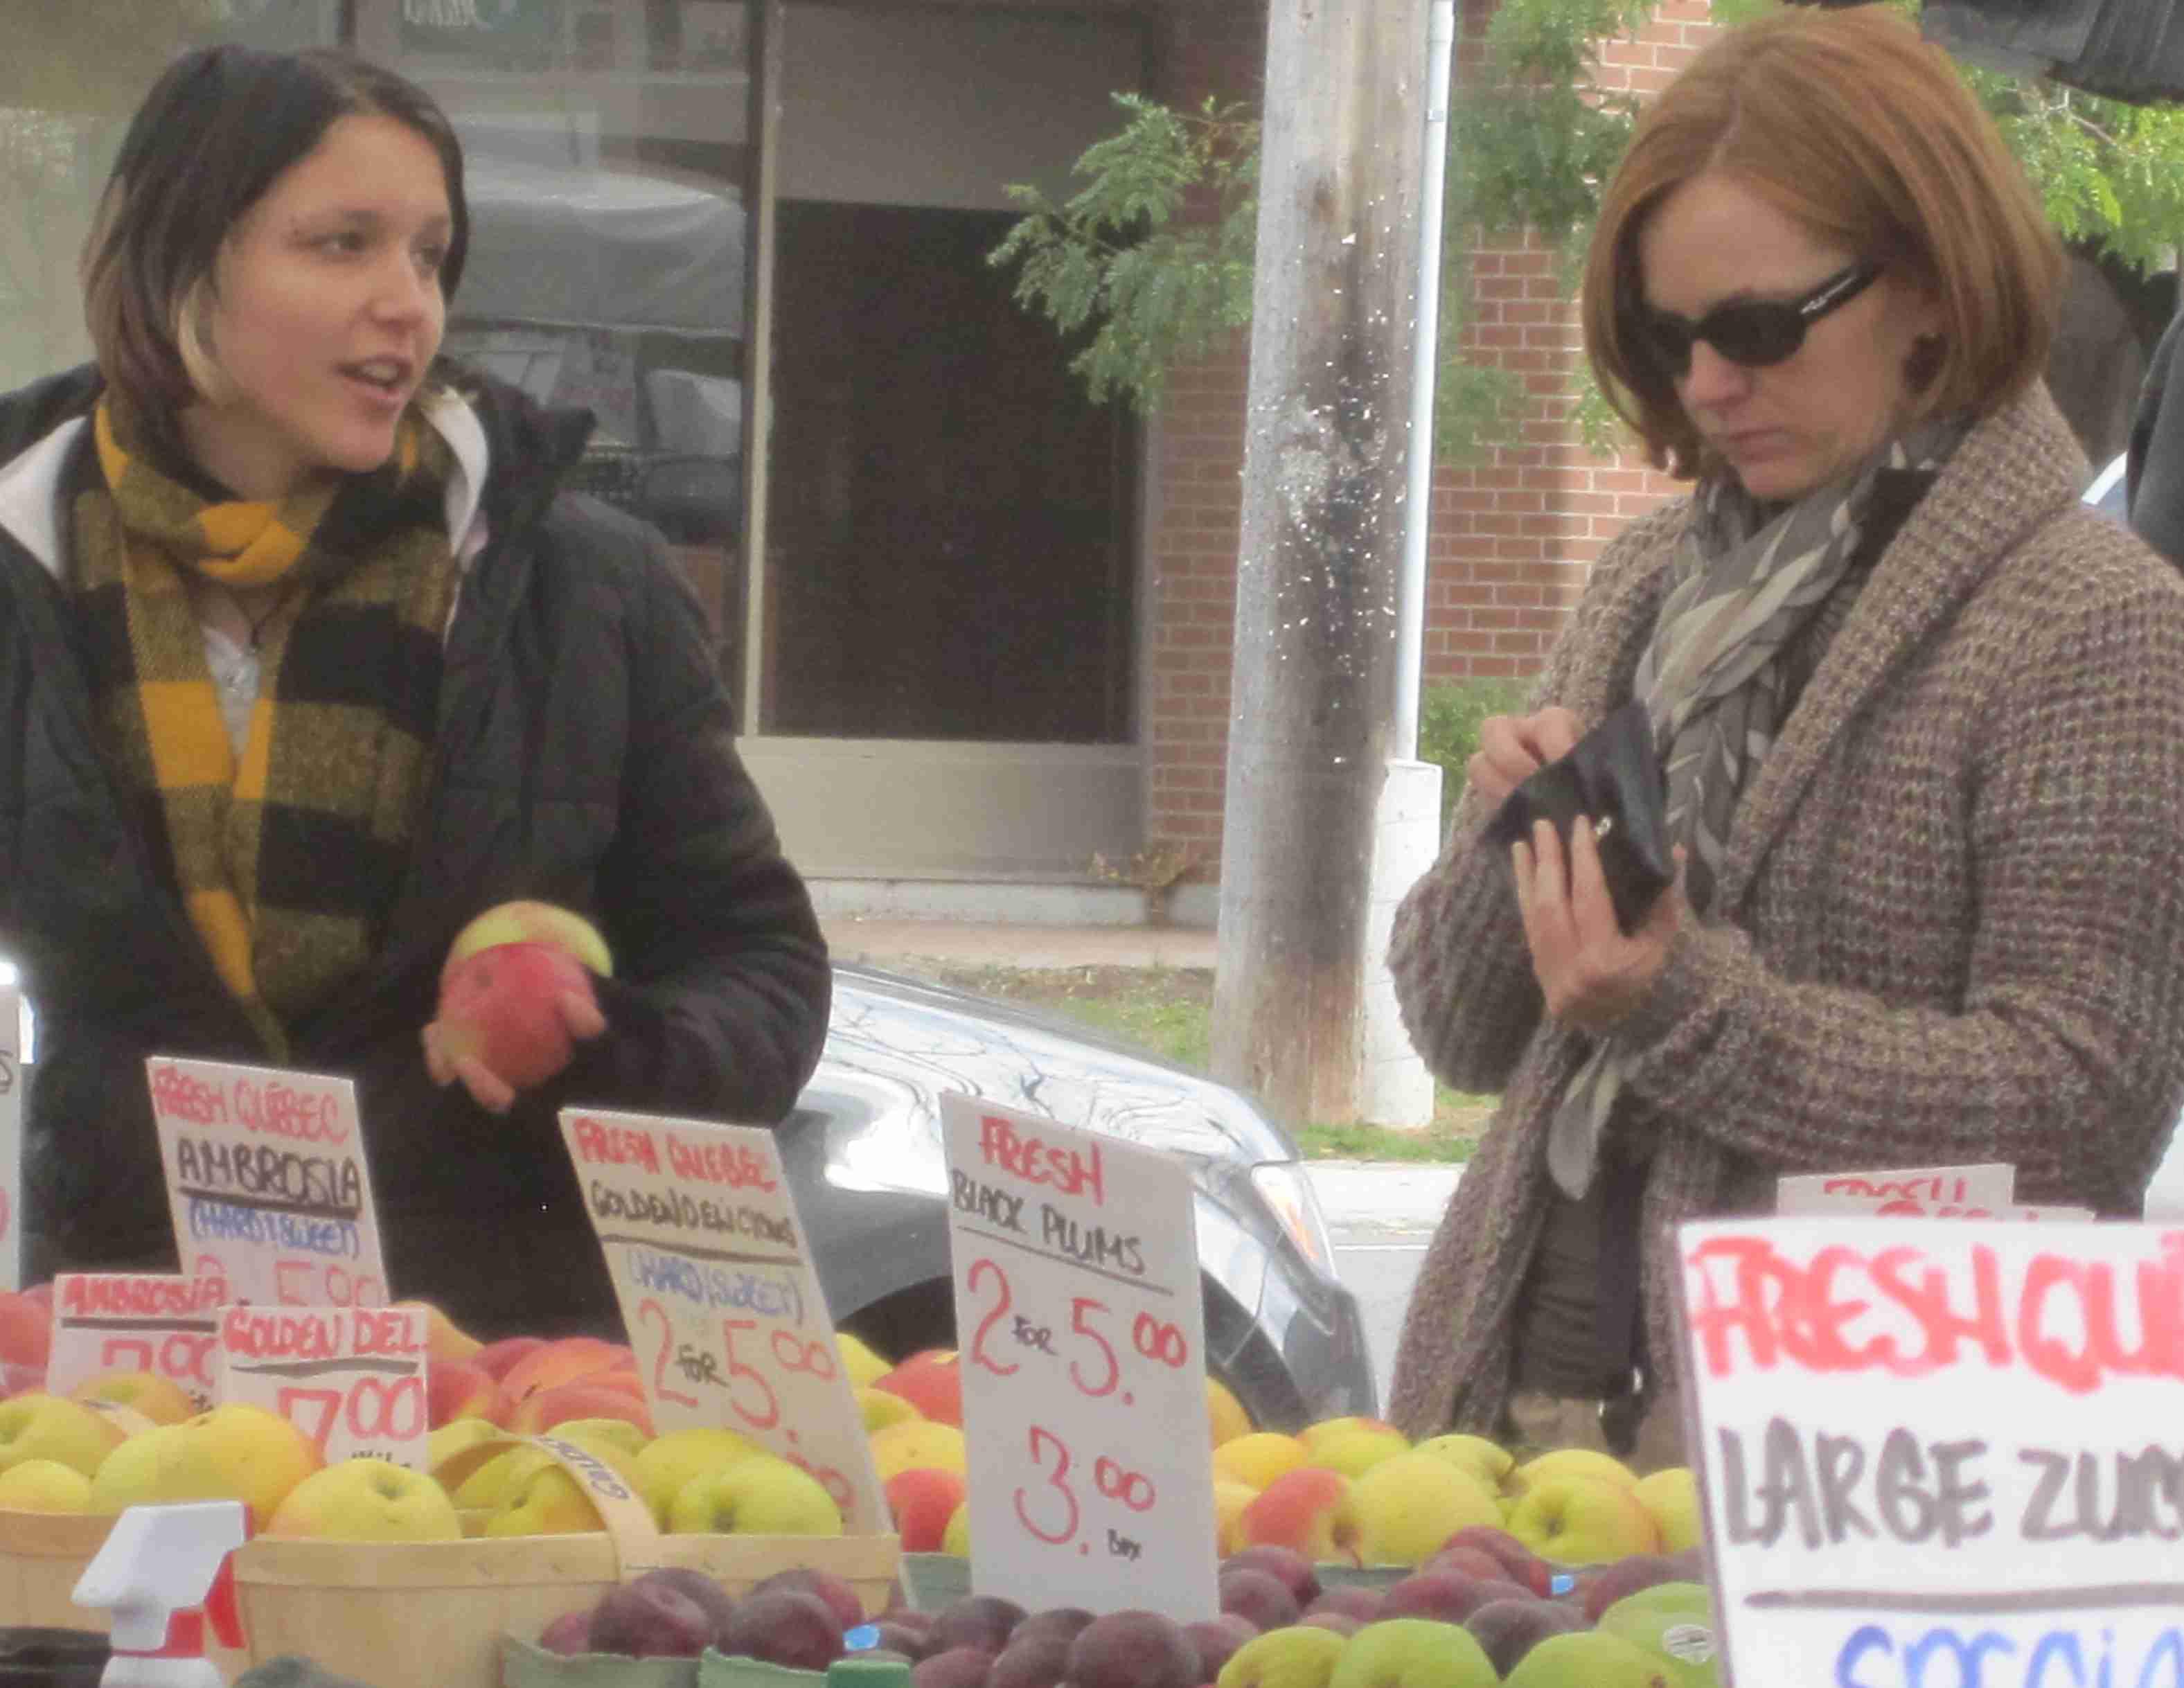 2011 10 23 urban commuter Parkdale market 13